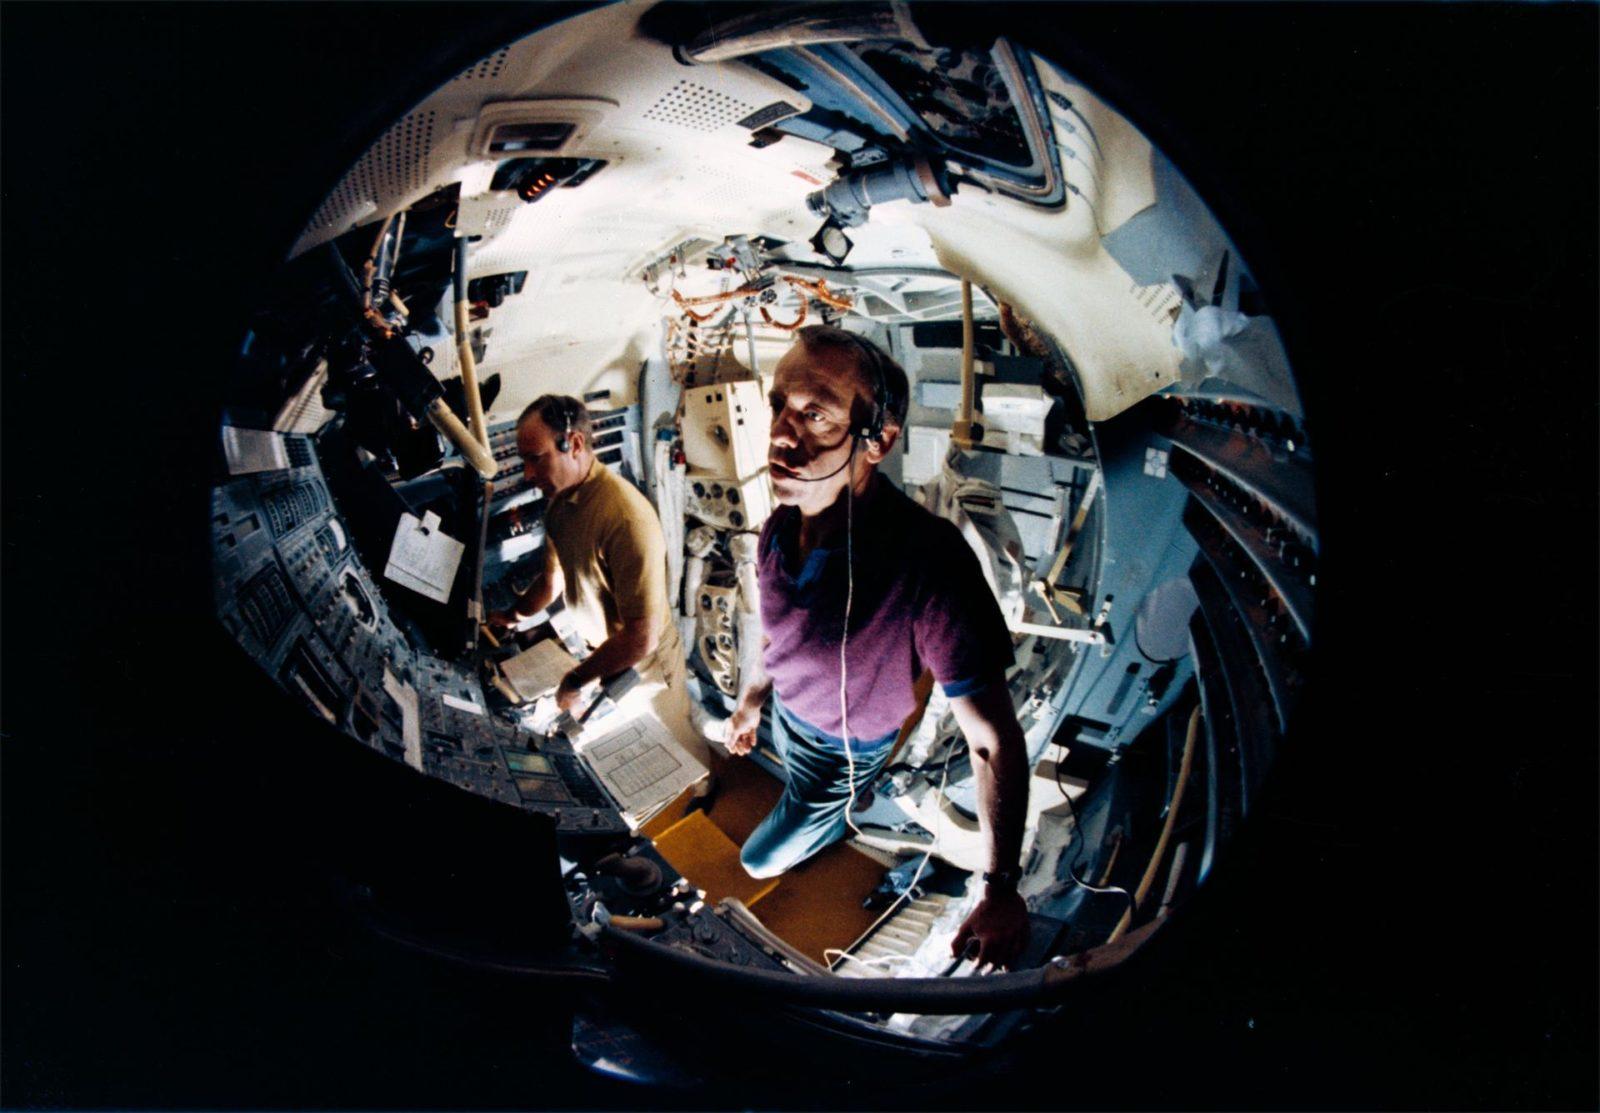 Fish-eye lens view Astronauts Shepard and Mitchell in Lunar Module Simulator